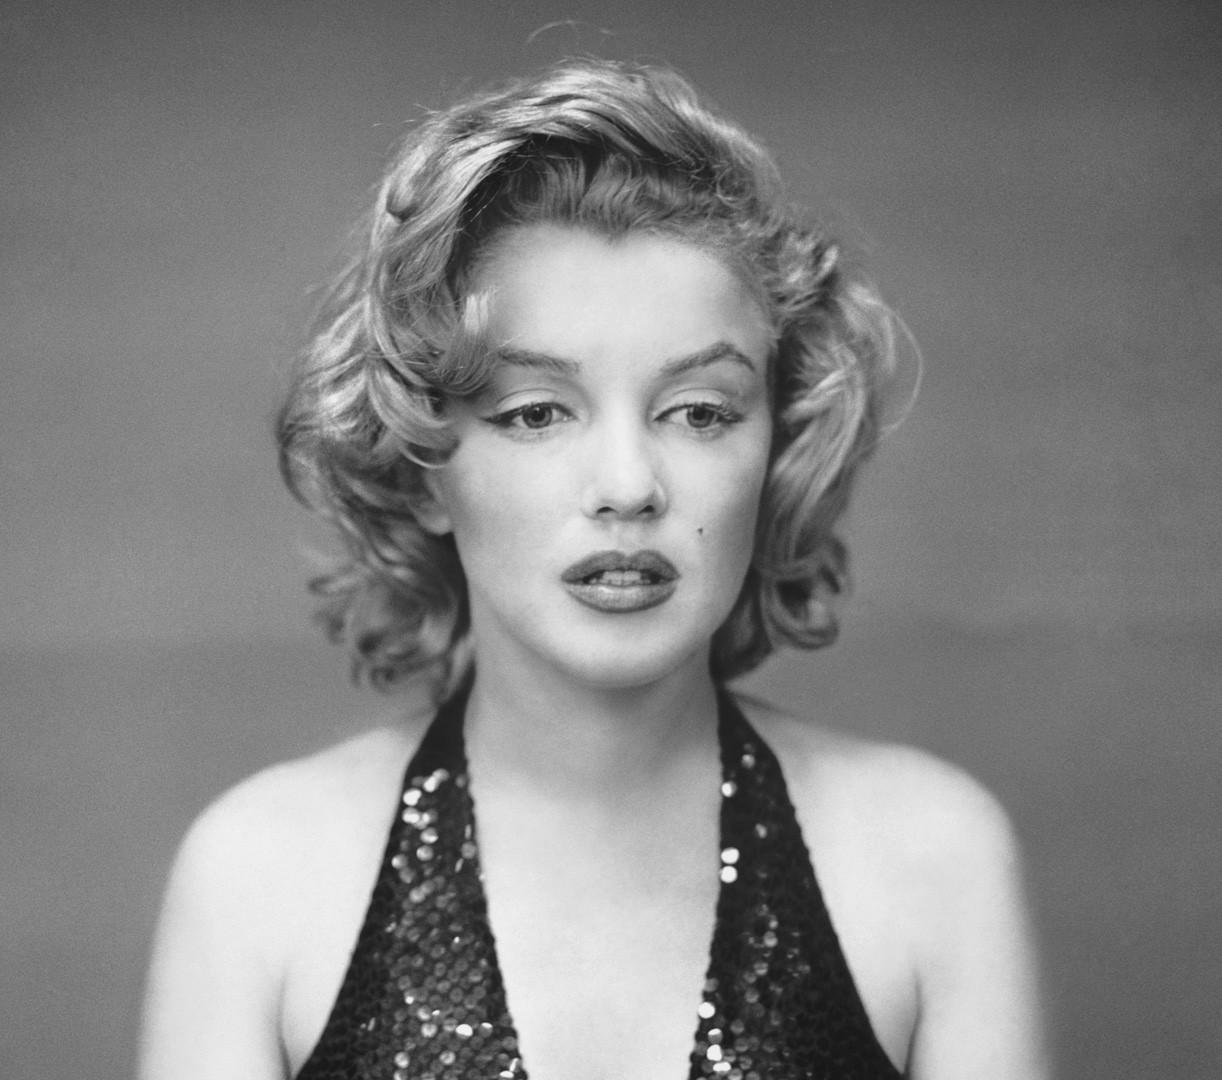 Richard Avedon, Marilyn Monroe, actress, New York City, May 6, 1957